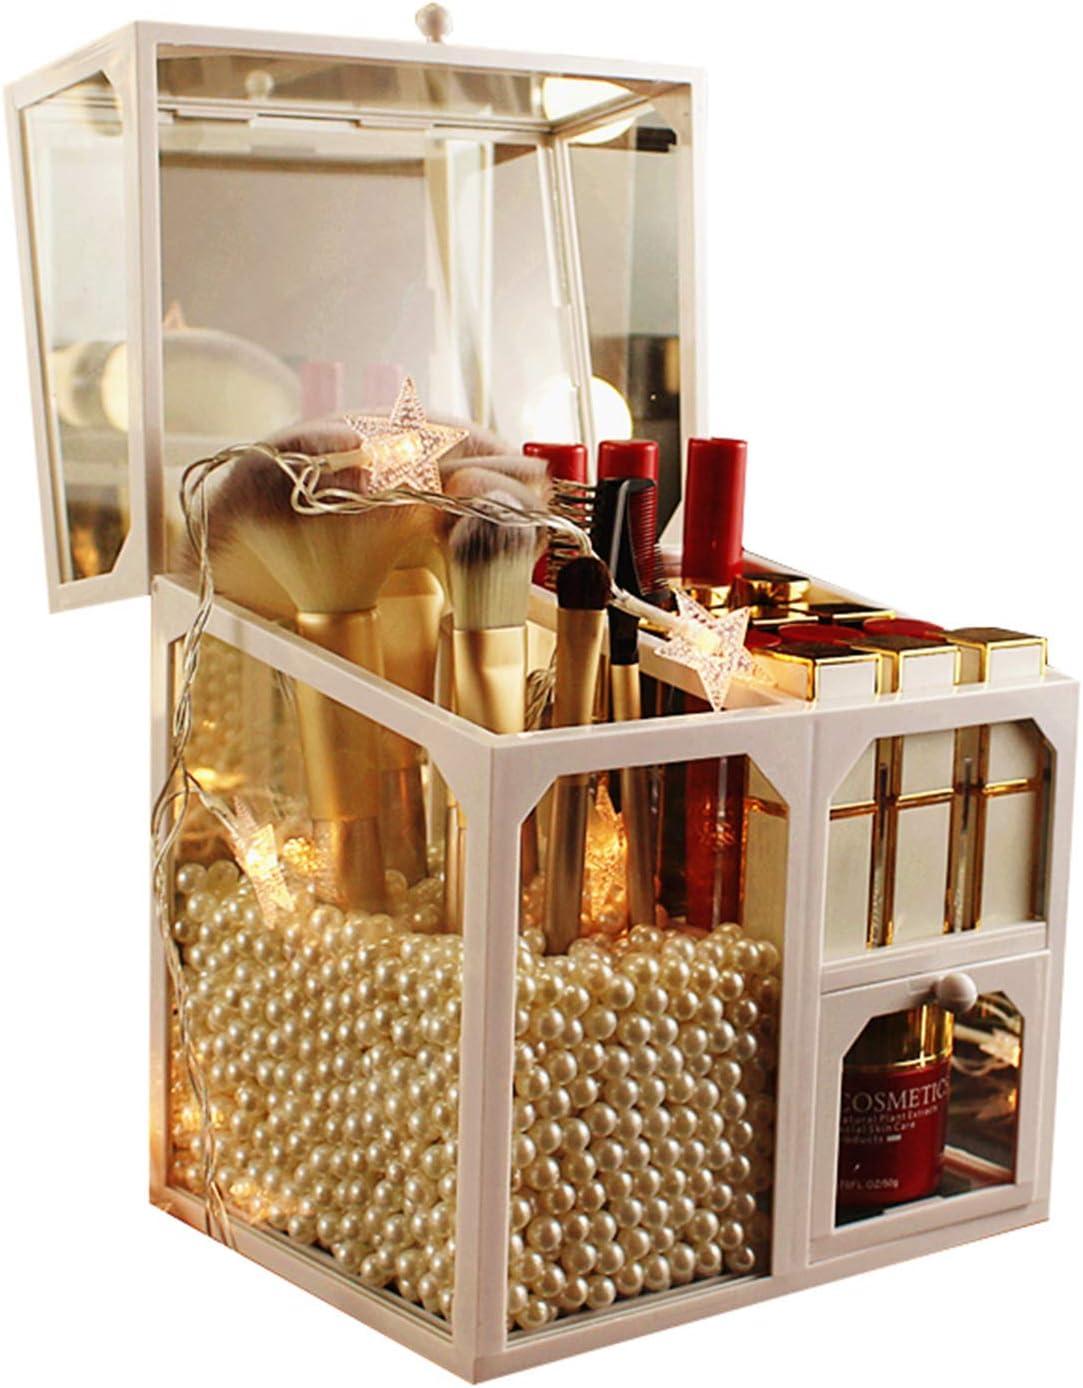 Makeup Brush Holder for Vanity, Flip lid with Dust Proof, Glass Makeup Organizer , Brushes and Lipsticks Holder